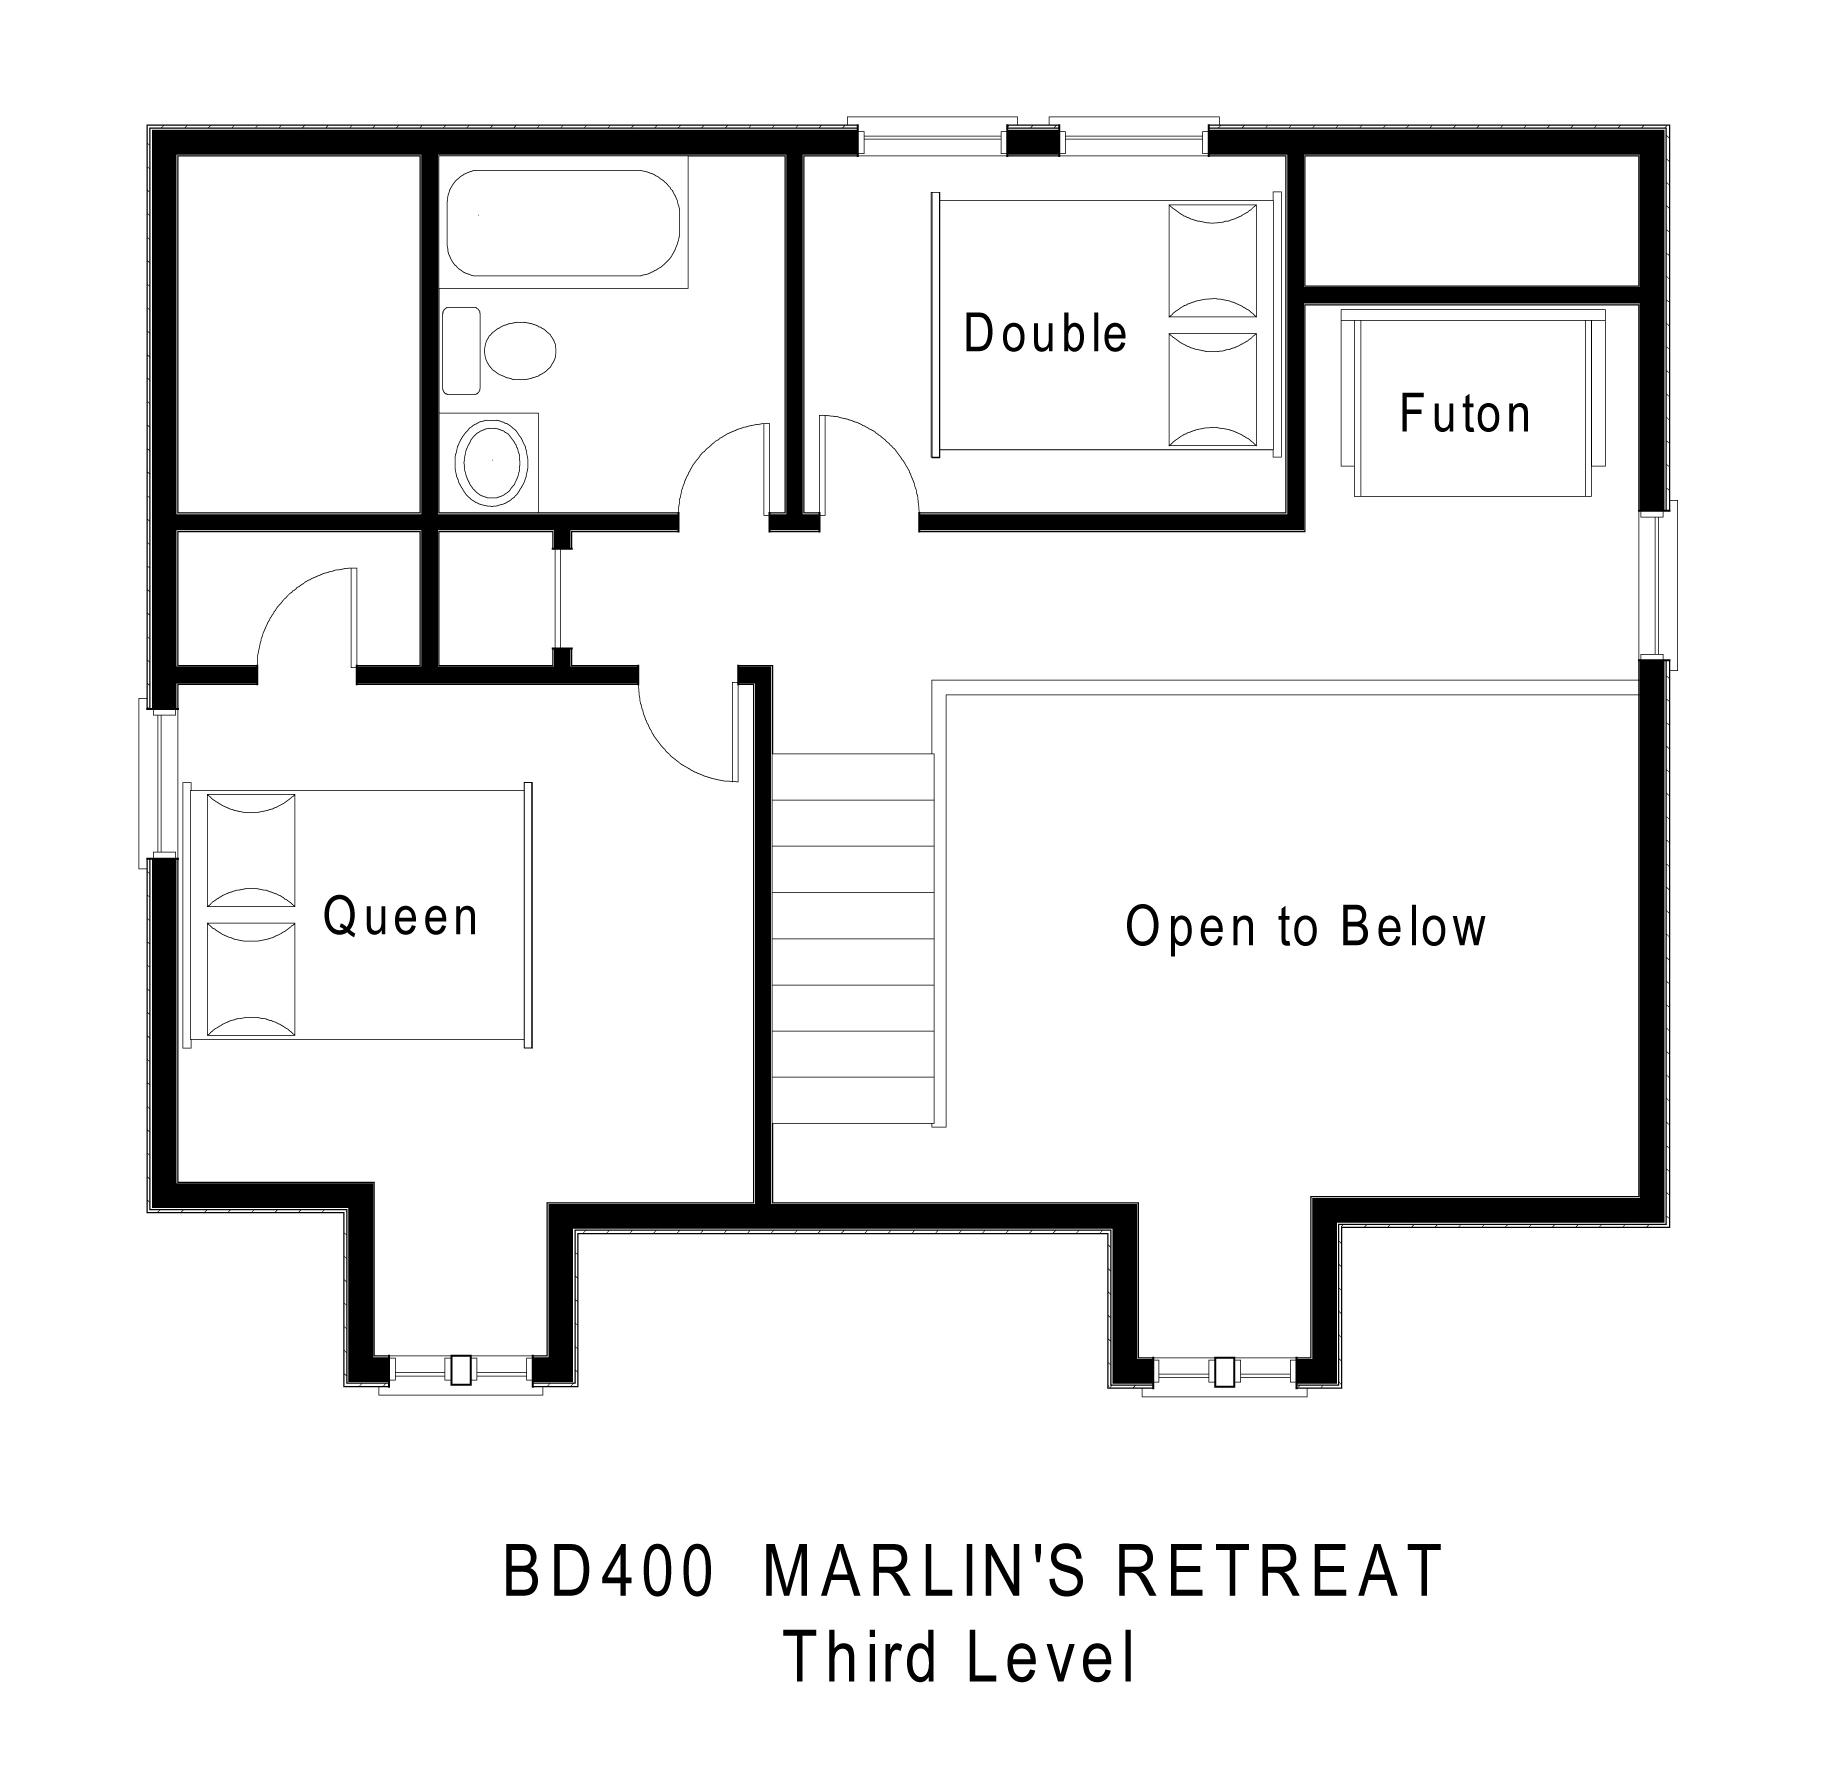 Marlin 39 s retreat hatteras rental midget realty for The retreat floor plans